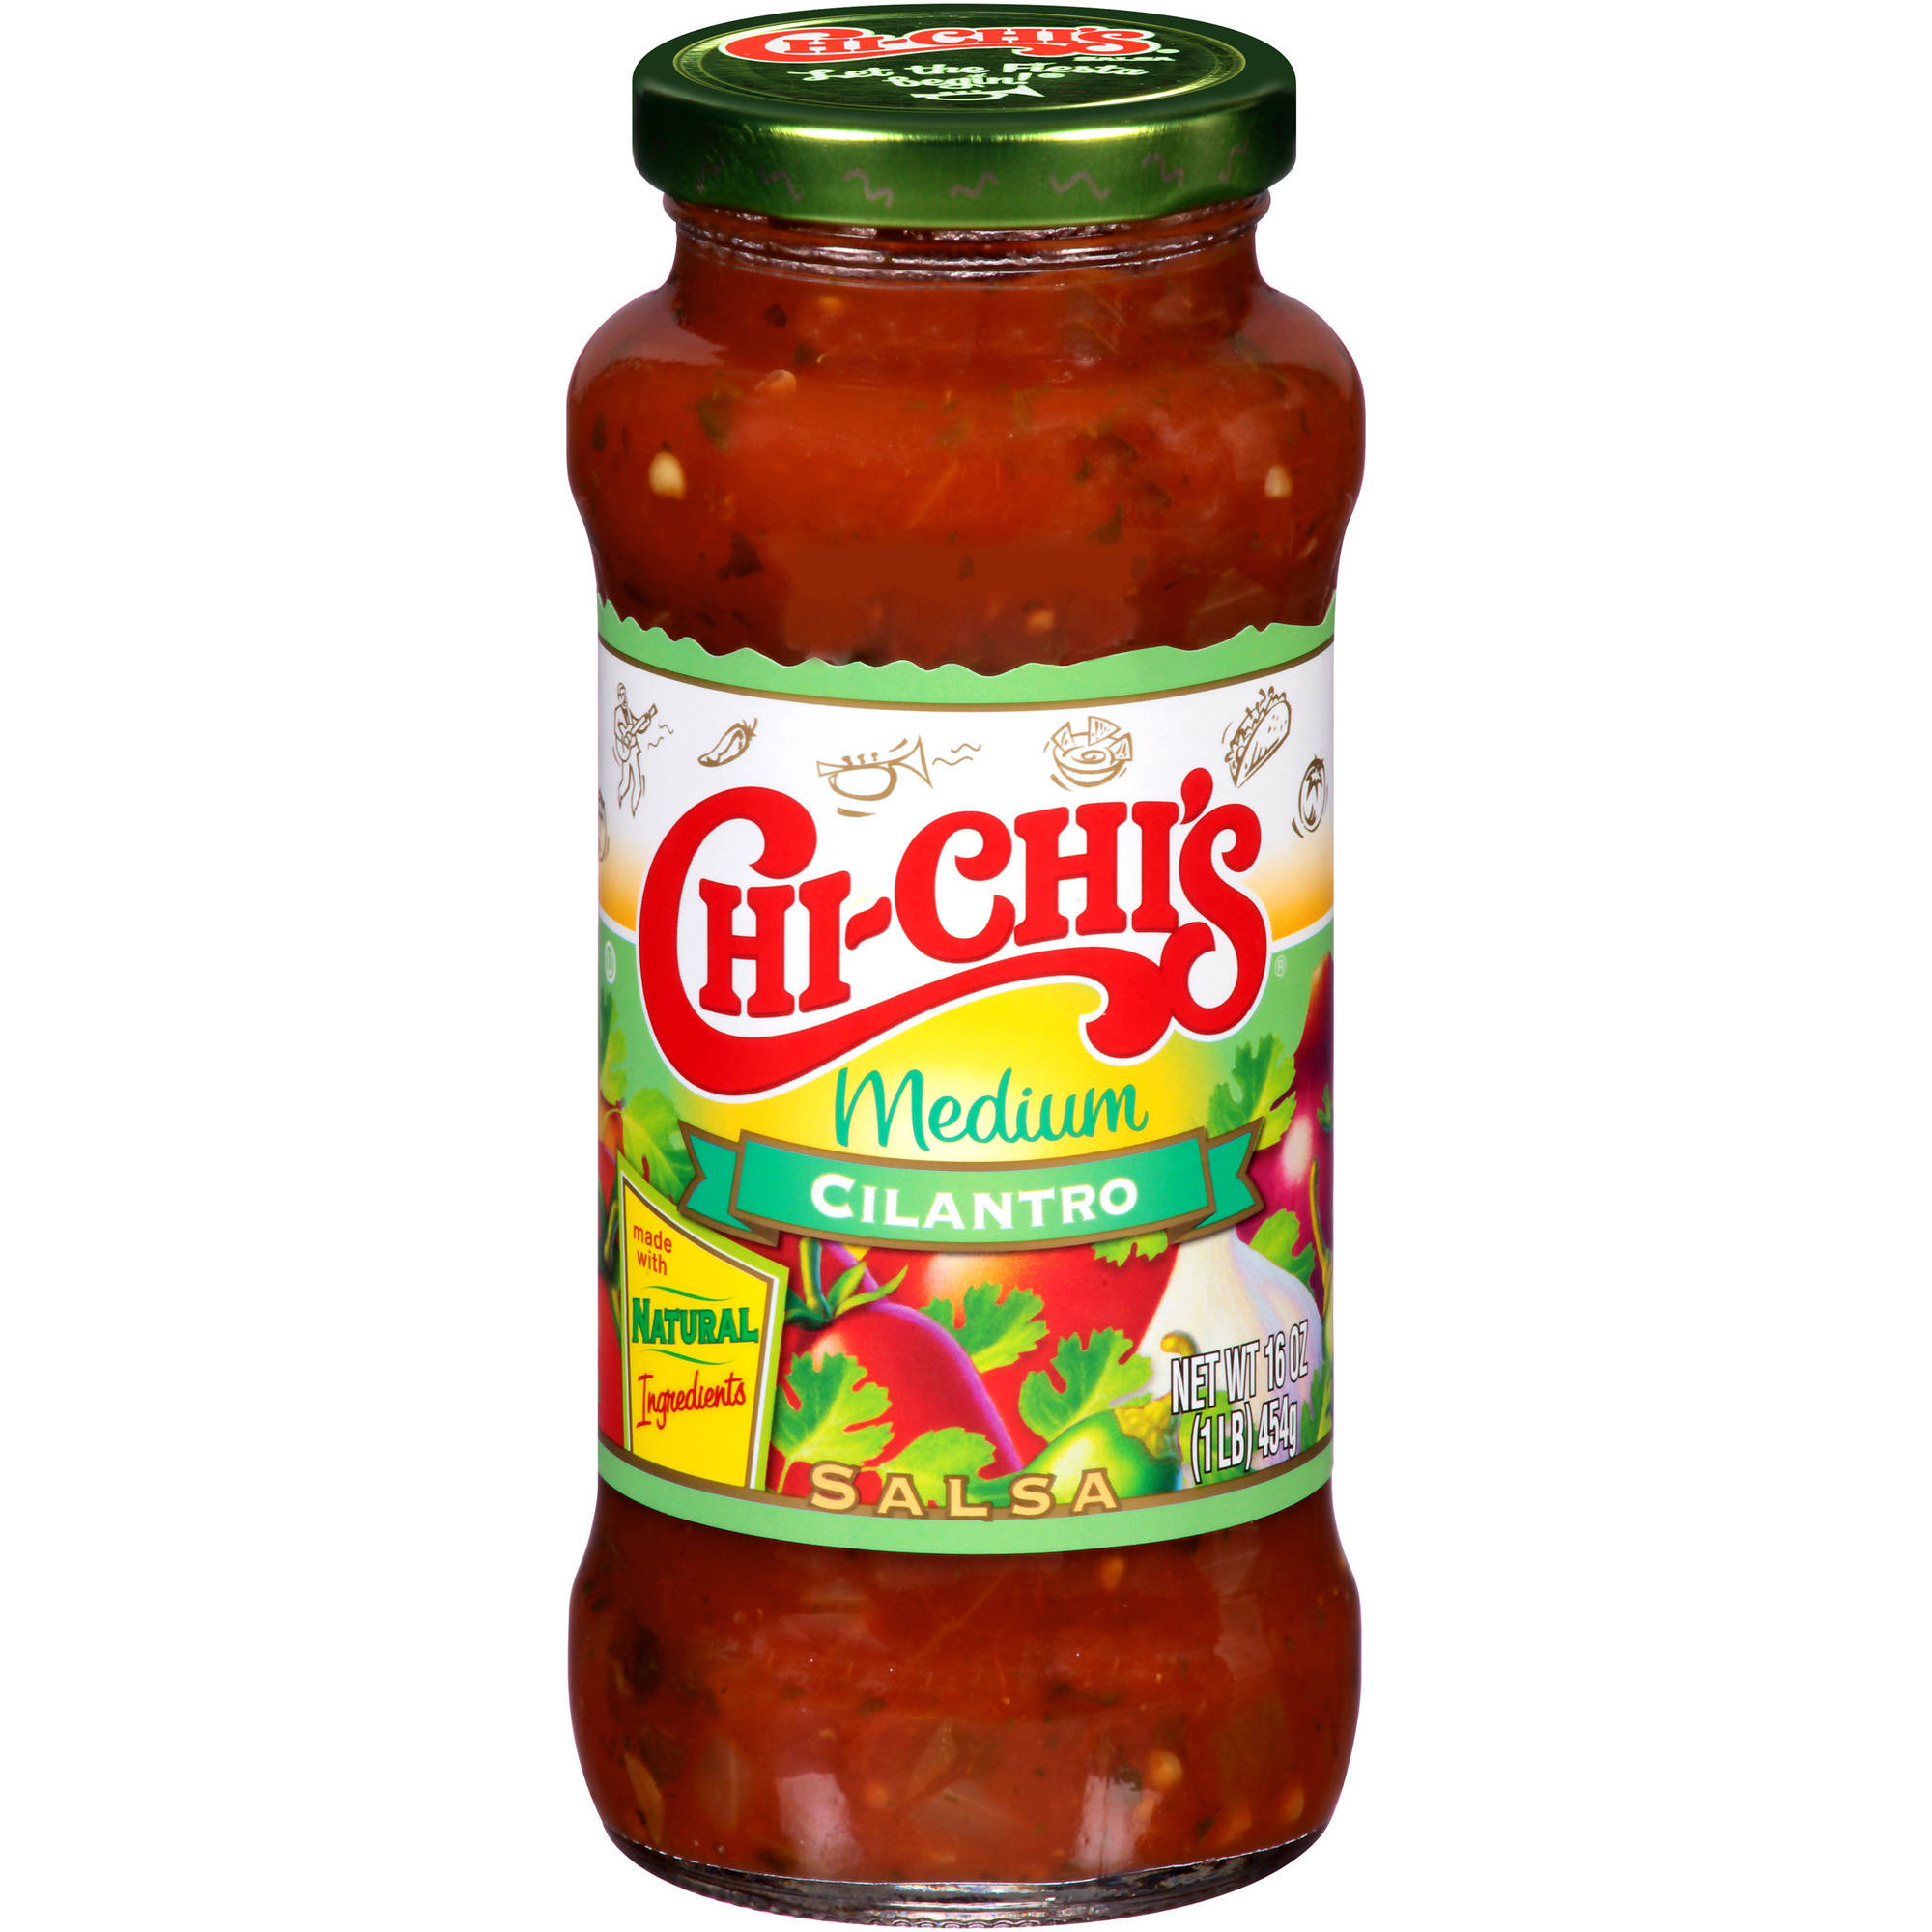 Chi-Chi's Medium Cilantro Salsa, 16 oz